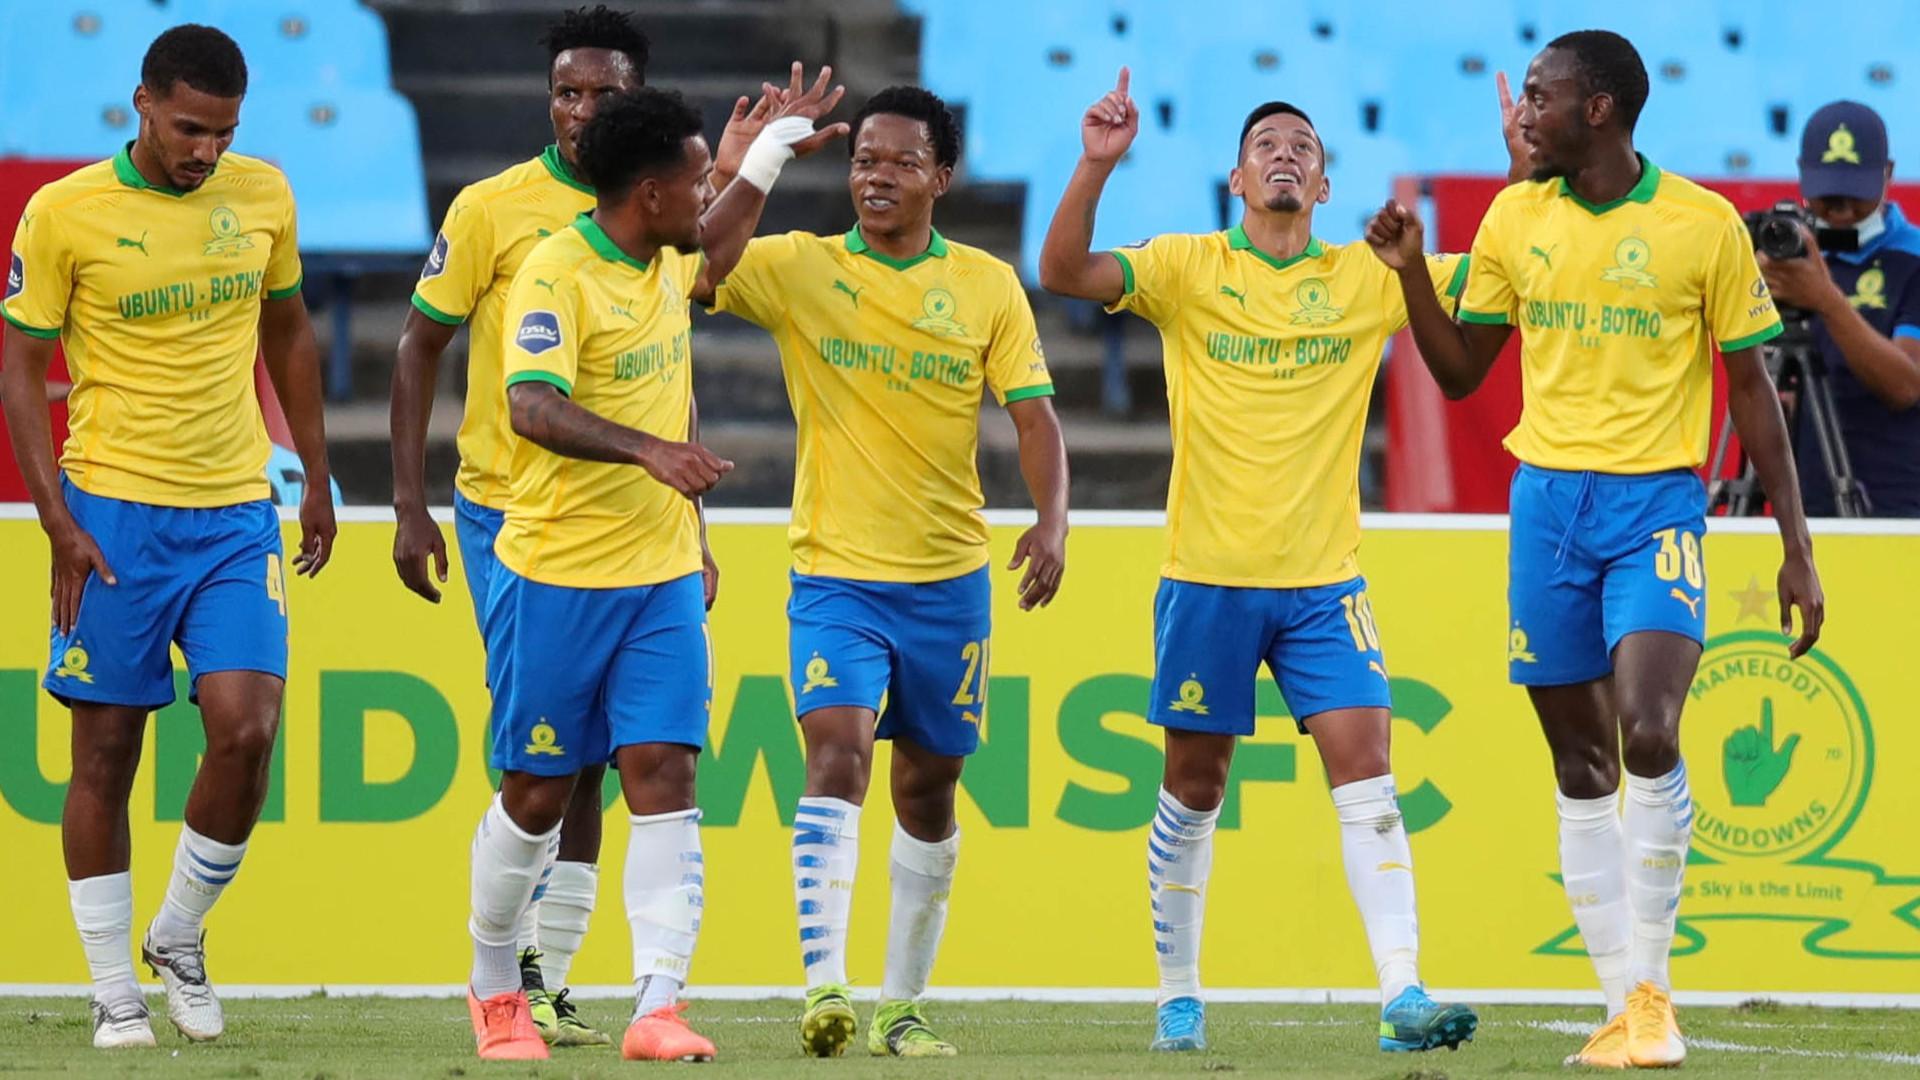 Top 15 Mamelodi Sundowns Highest Paid Players 2021